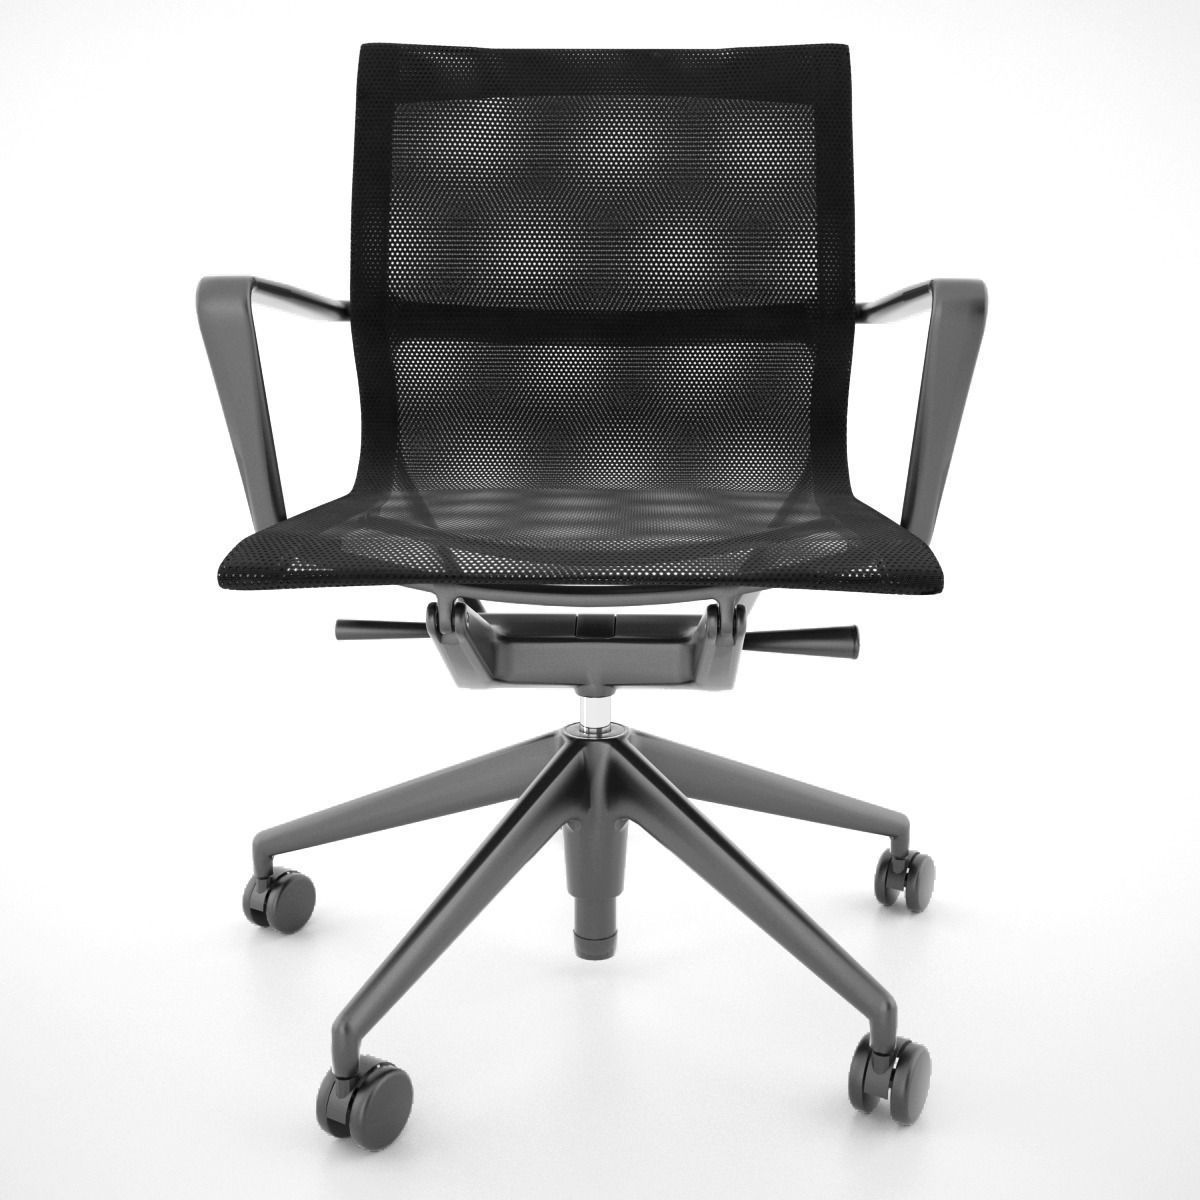 vitra physix office chair 3d model max obj fbx. Black Bedroom Furniture Sets. Home Design Ideas